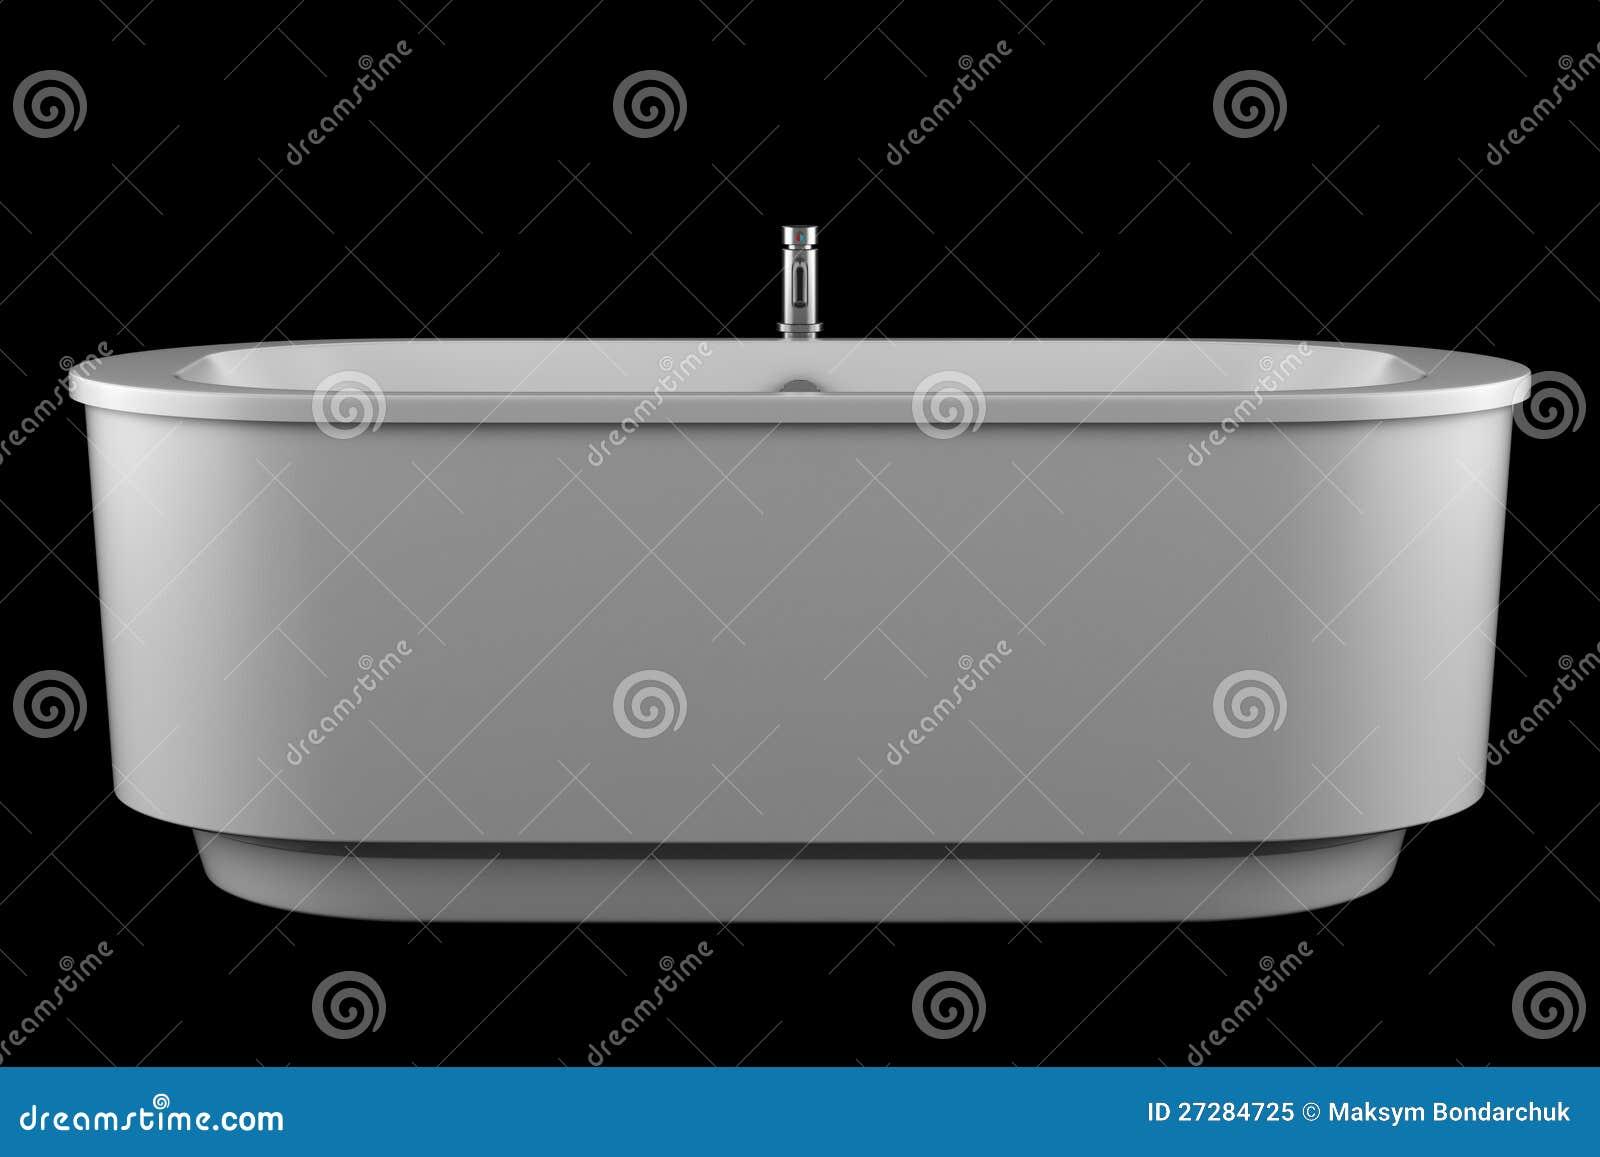 Modernt vitt badkar som isoleras på black